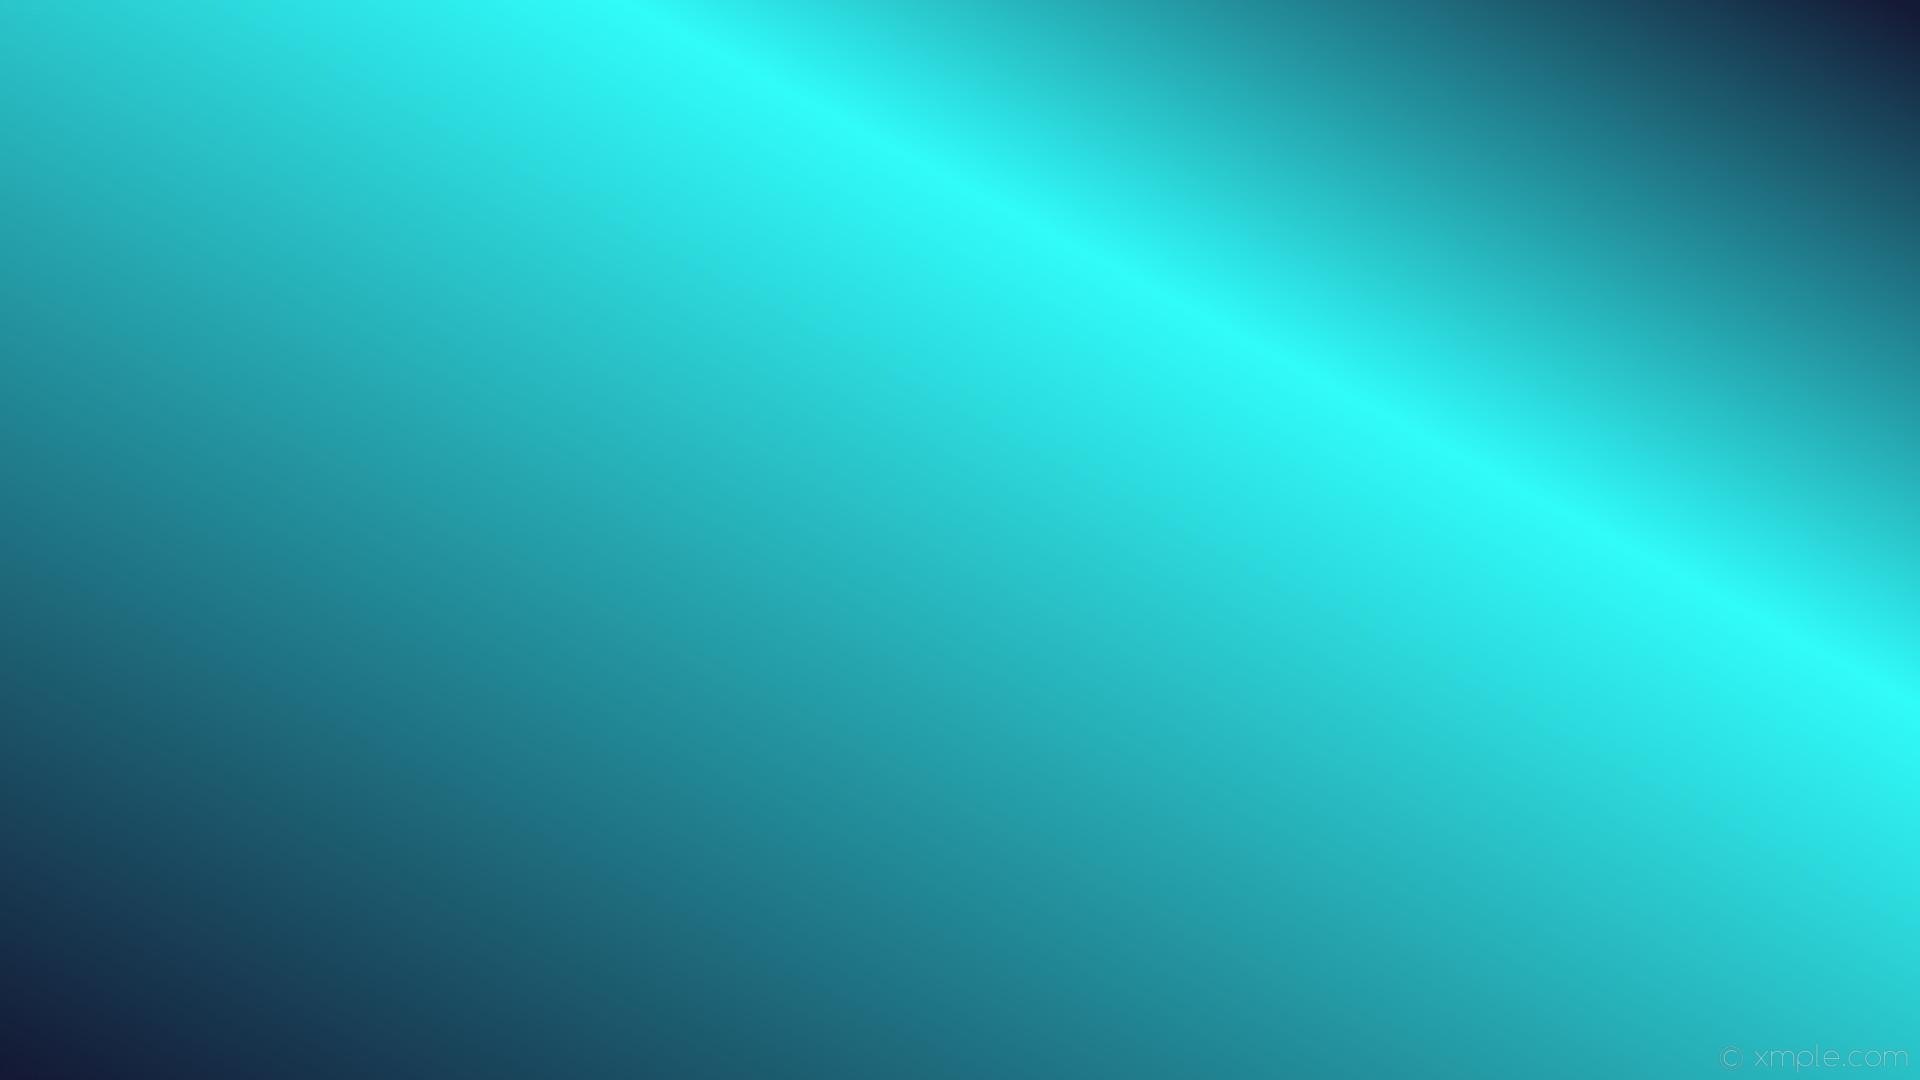 wallpaper highlight cyan blue gradient linear dark blue #141935 #30fcfa 30°  33%